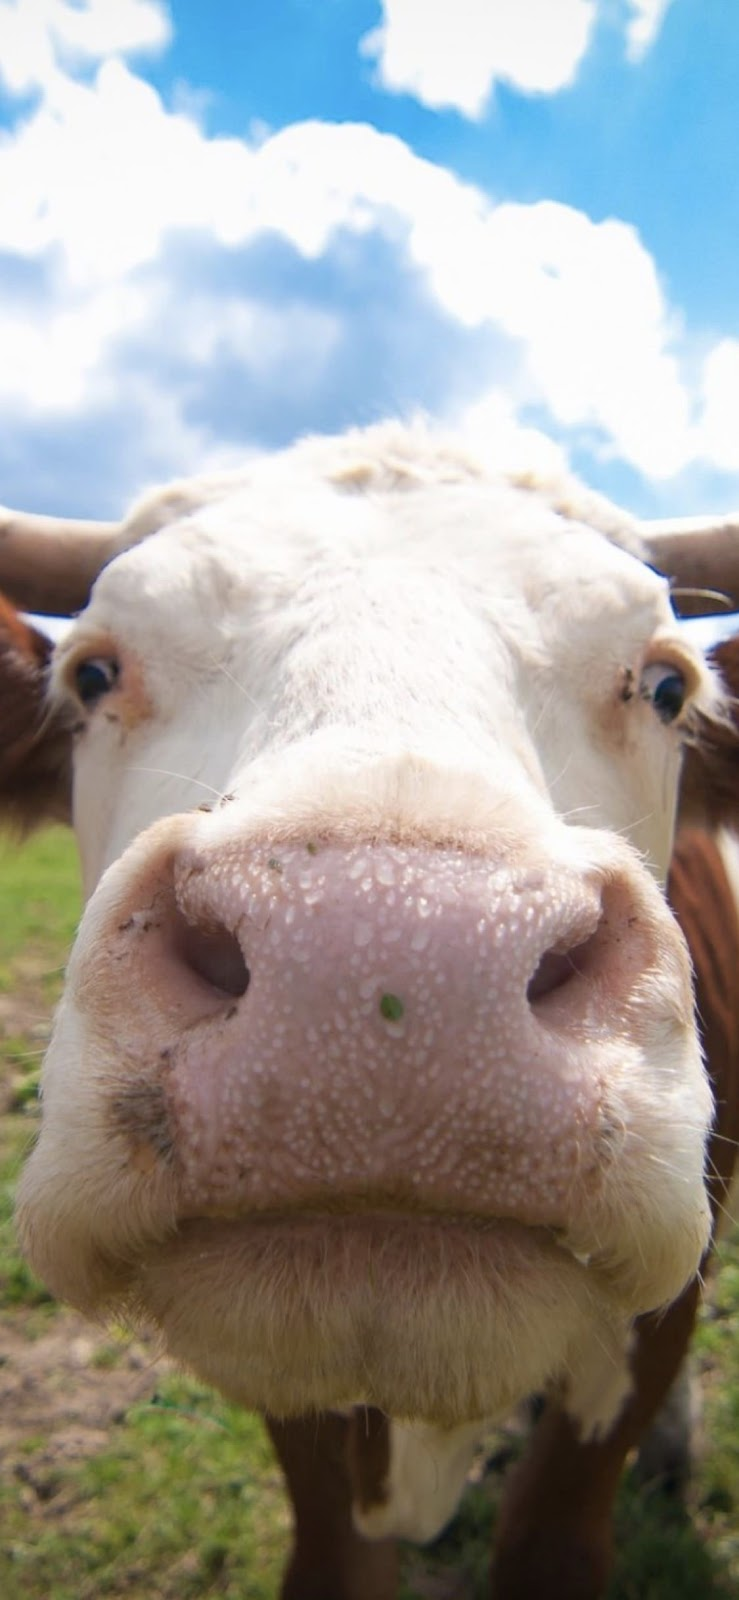 Wallpaper, sfondi iPhone, mucca, divertente, animali